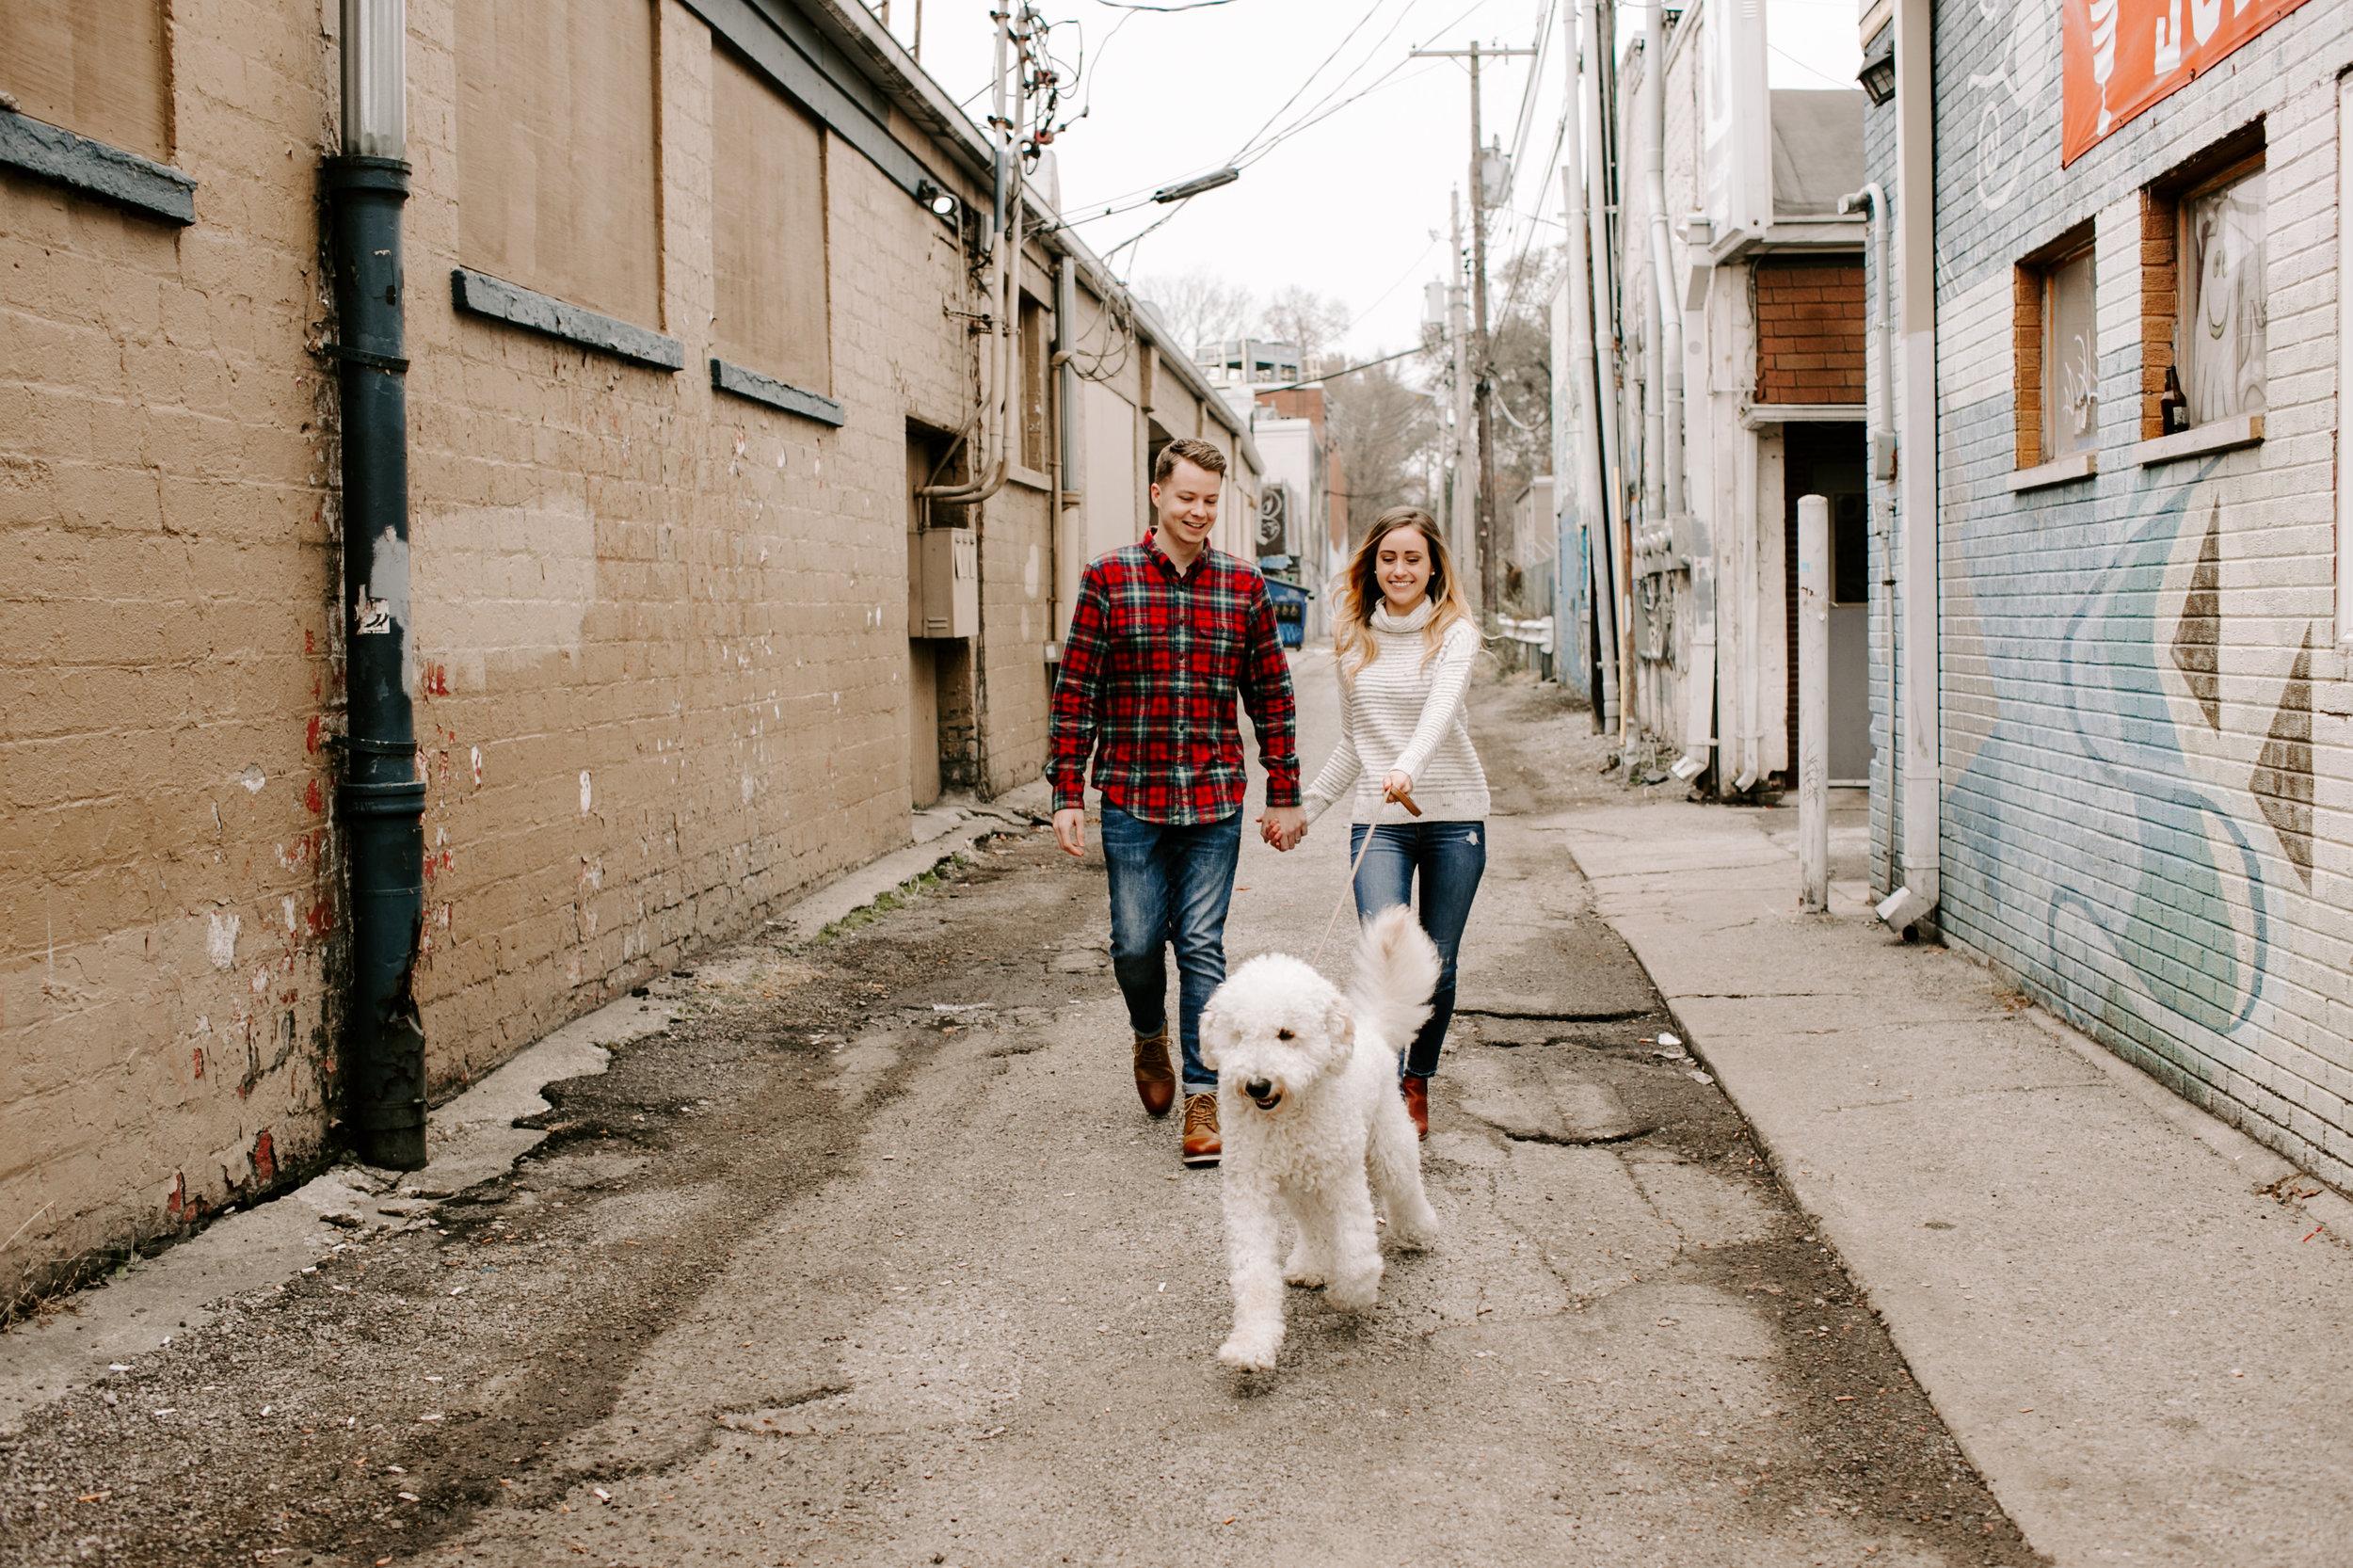 Hallie and Tyler Couple Photos downtown Broad Ripple Indiana Emily Elyse Wehner Photography LLC-35.jpg